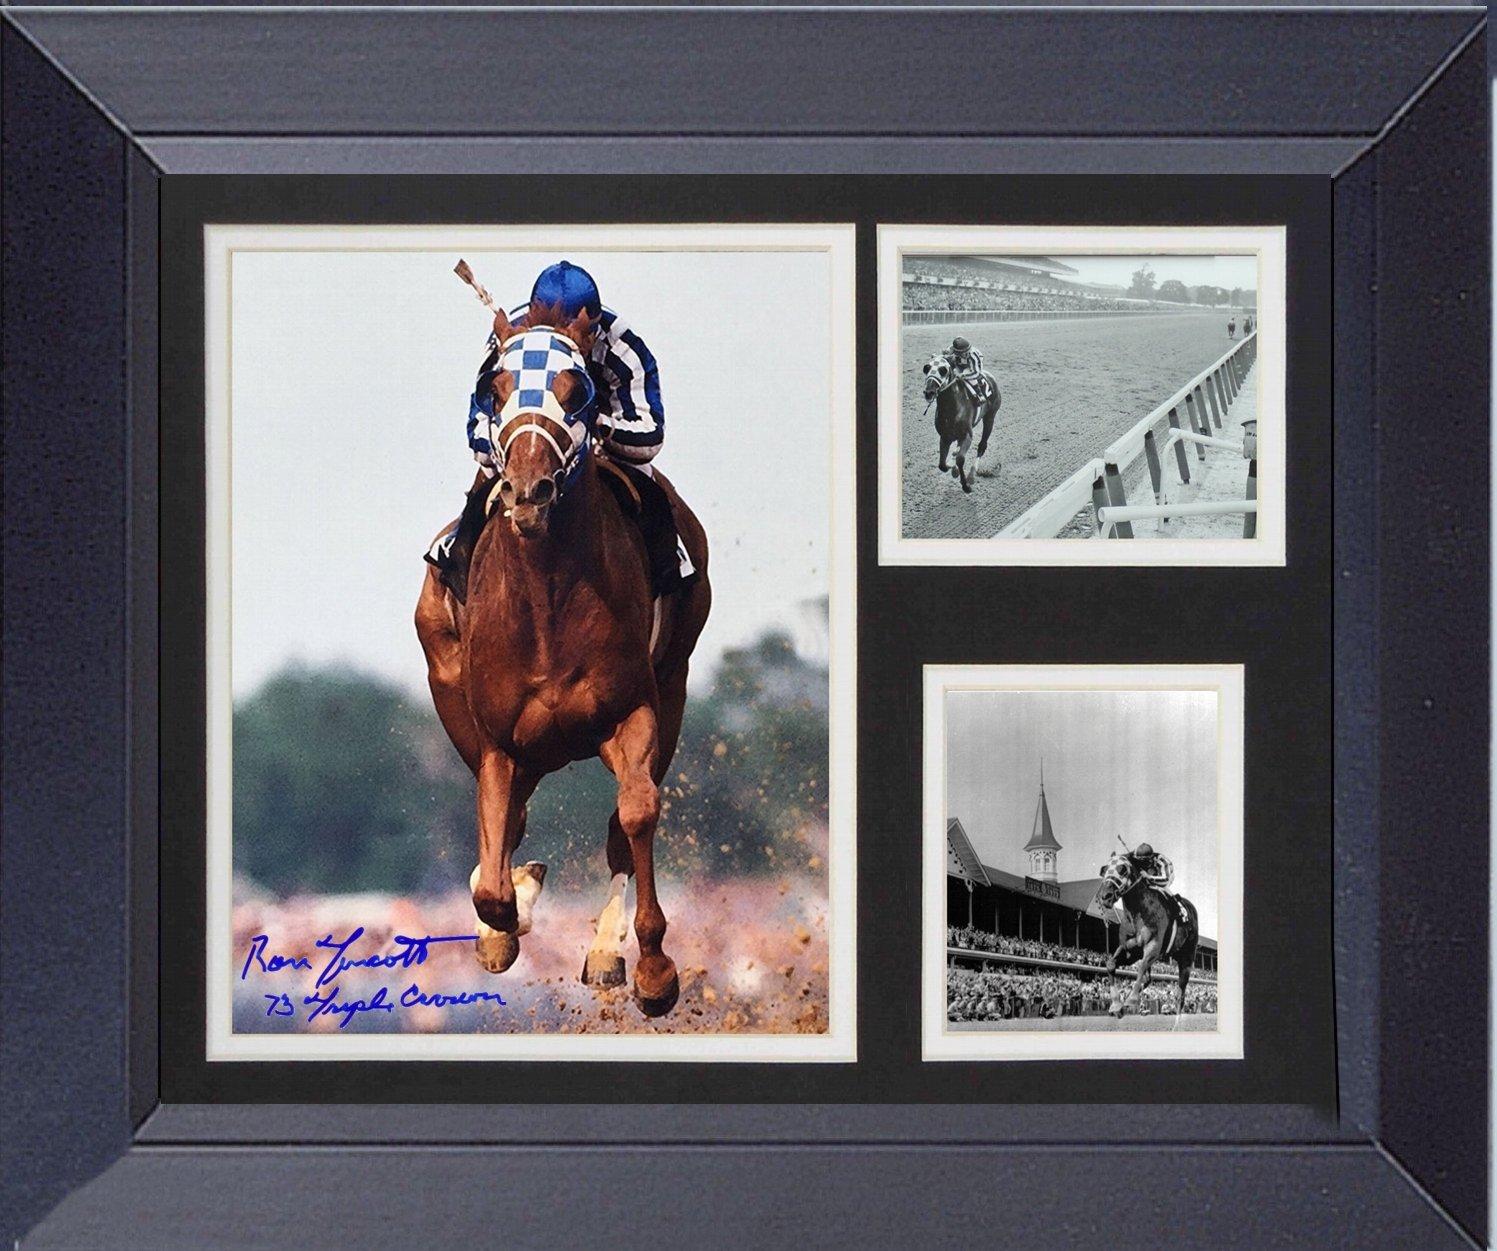 Secretariat: Framed 14 x 17 Thoroughbred Racing's 1973 Triple Crown Winner. Kentucky Derby